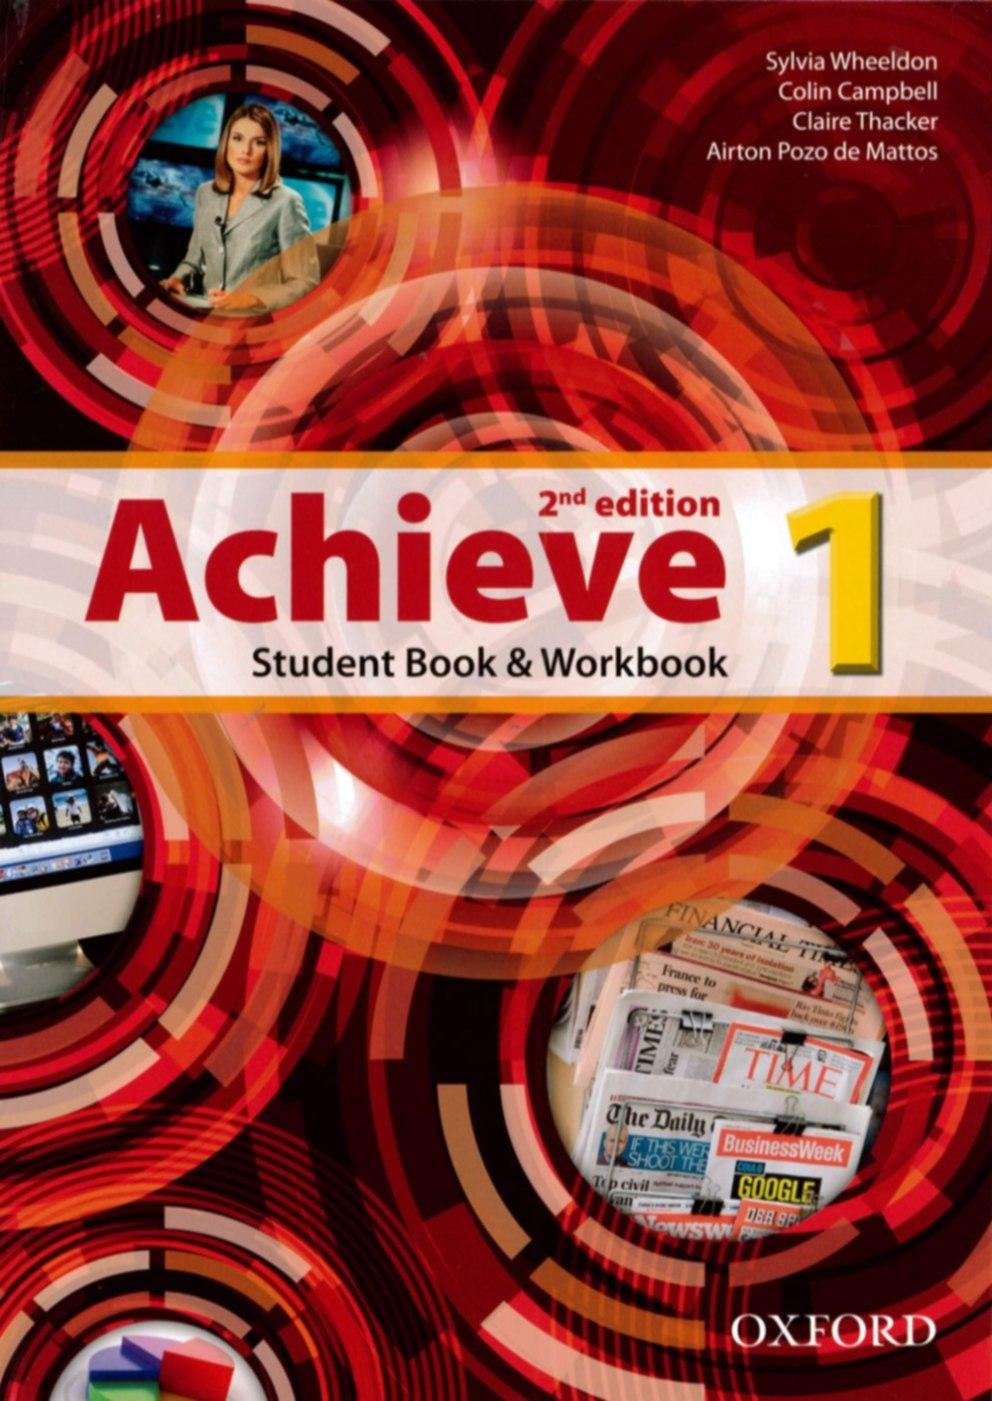 Achieve (1) Student Book & Workbook(2/e)